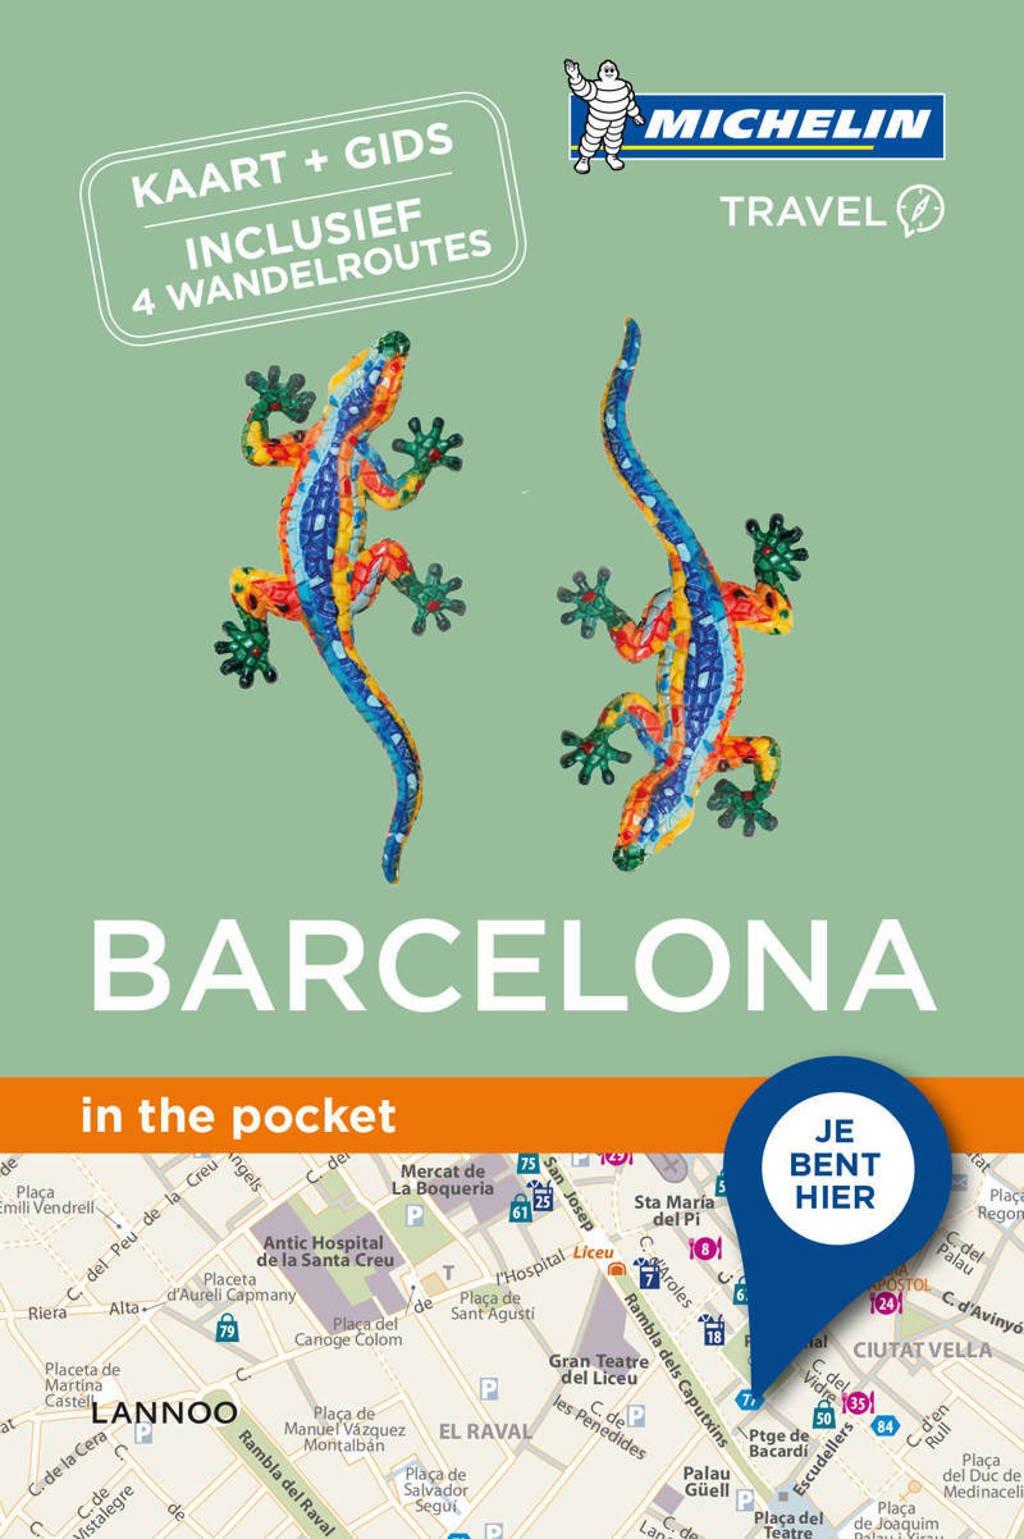 Michelin in the pocket: Barcelona